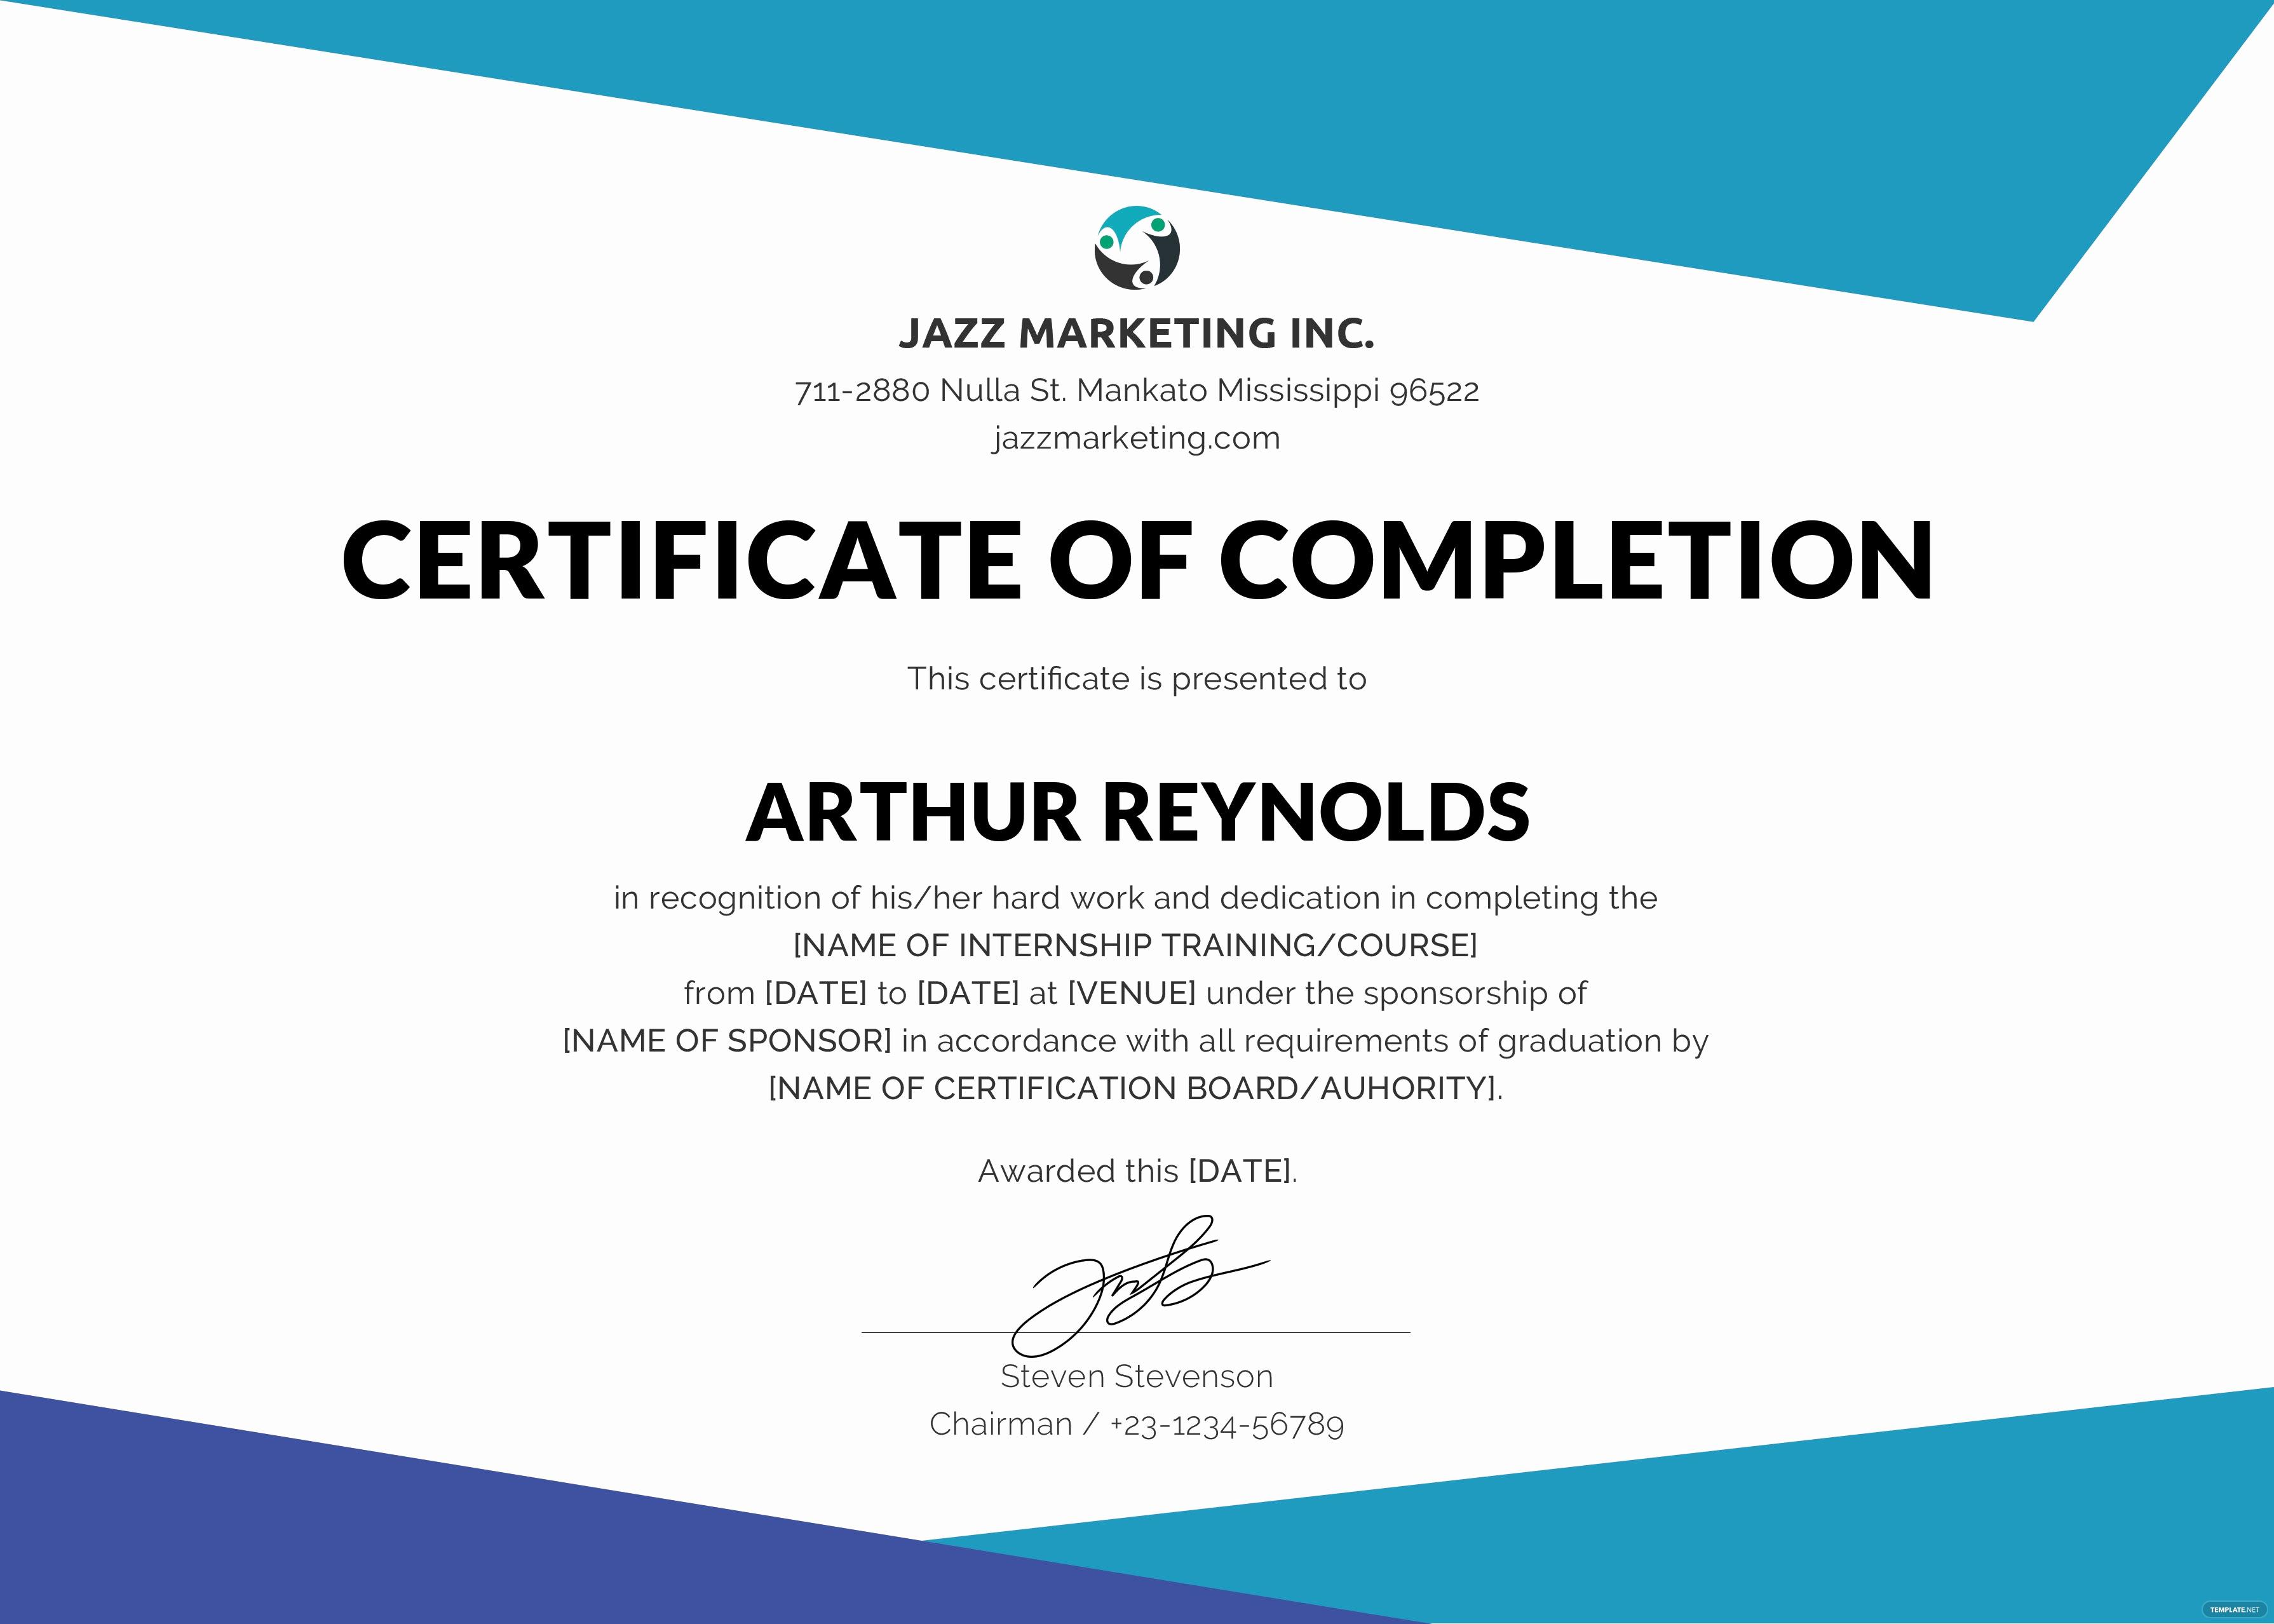 course pletion certificate